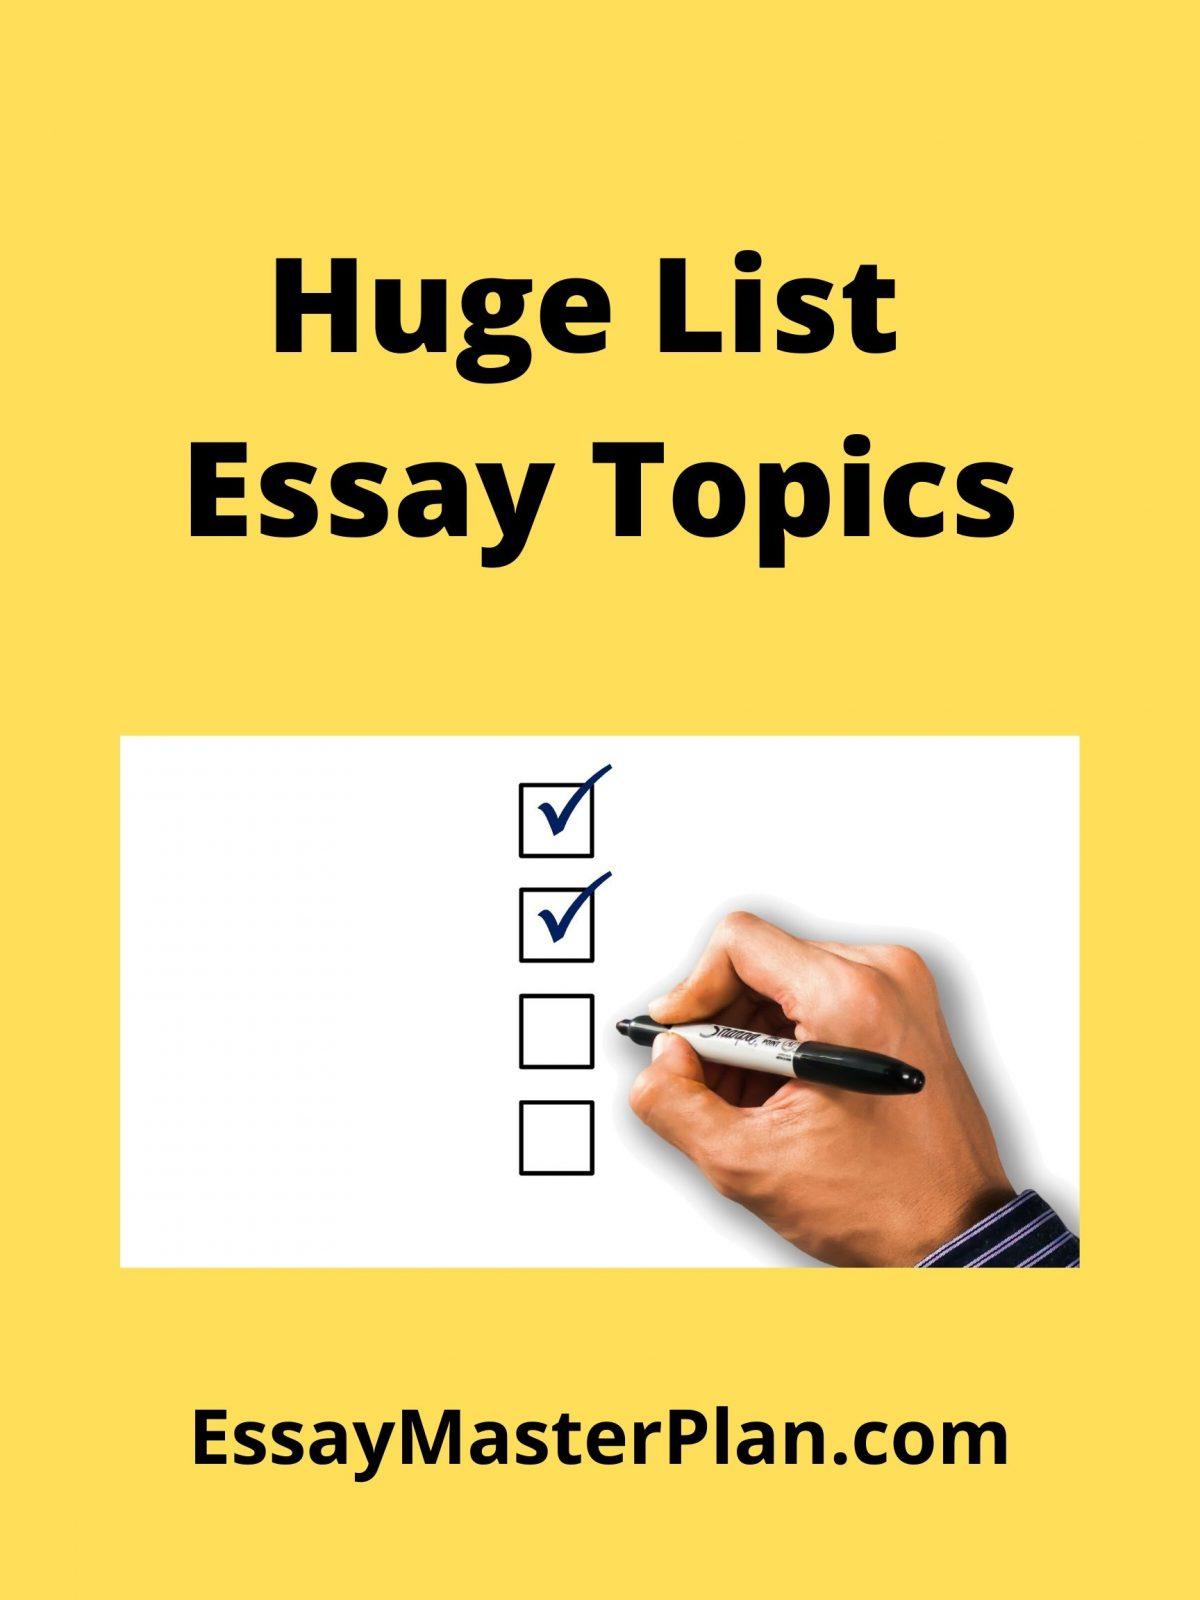 Essay Writing Outline/Essay Topics List